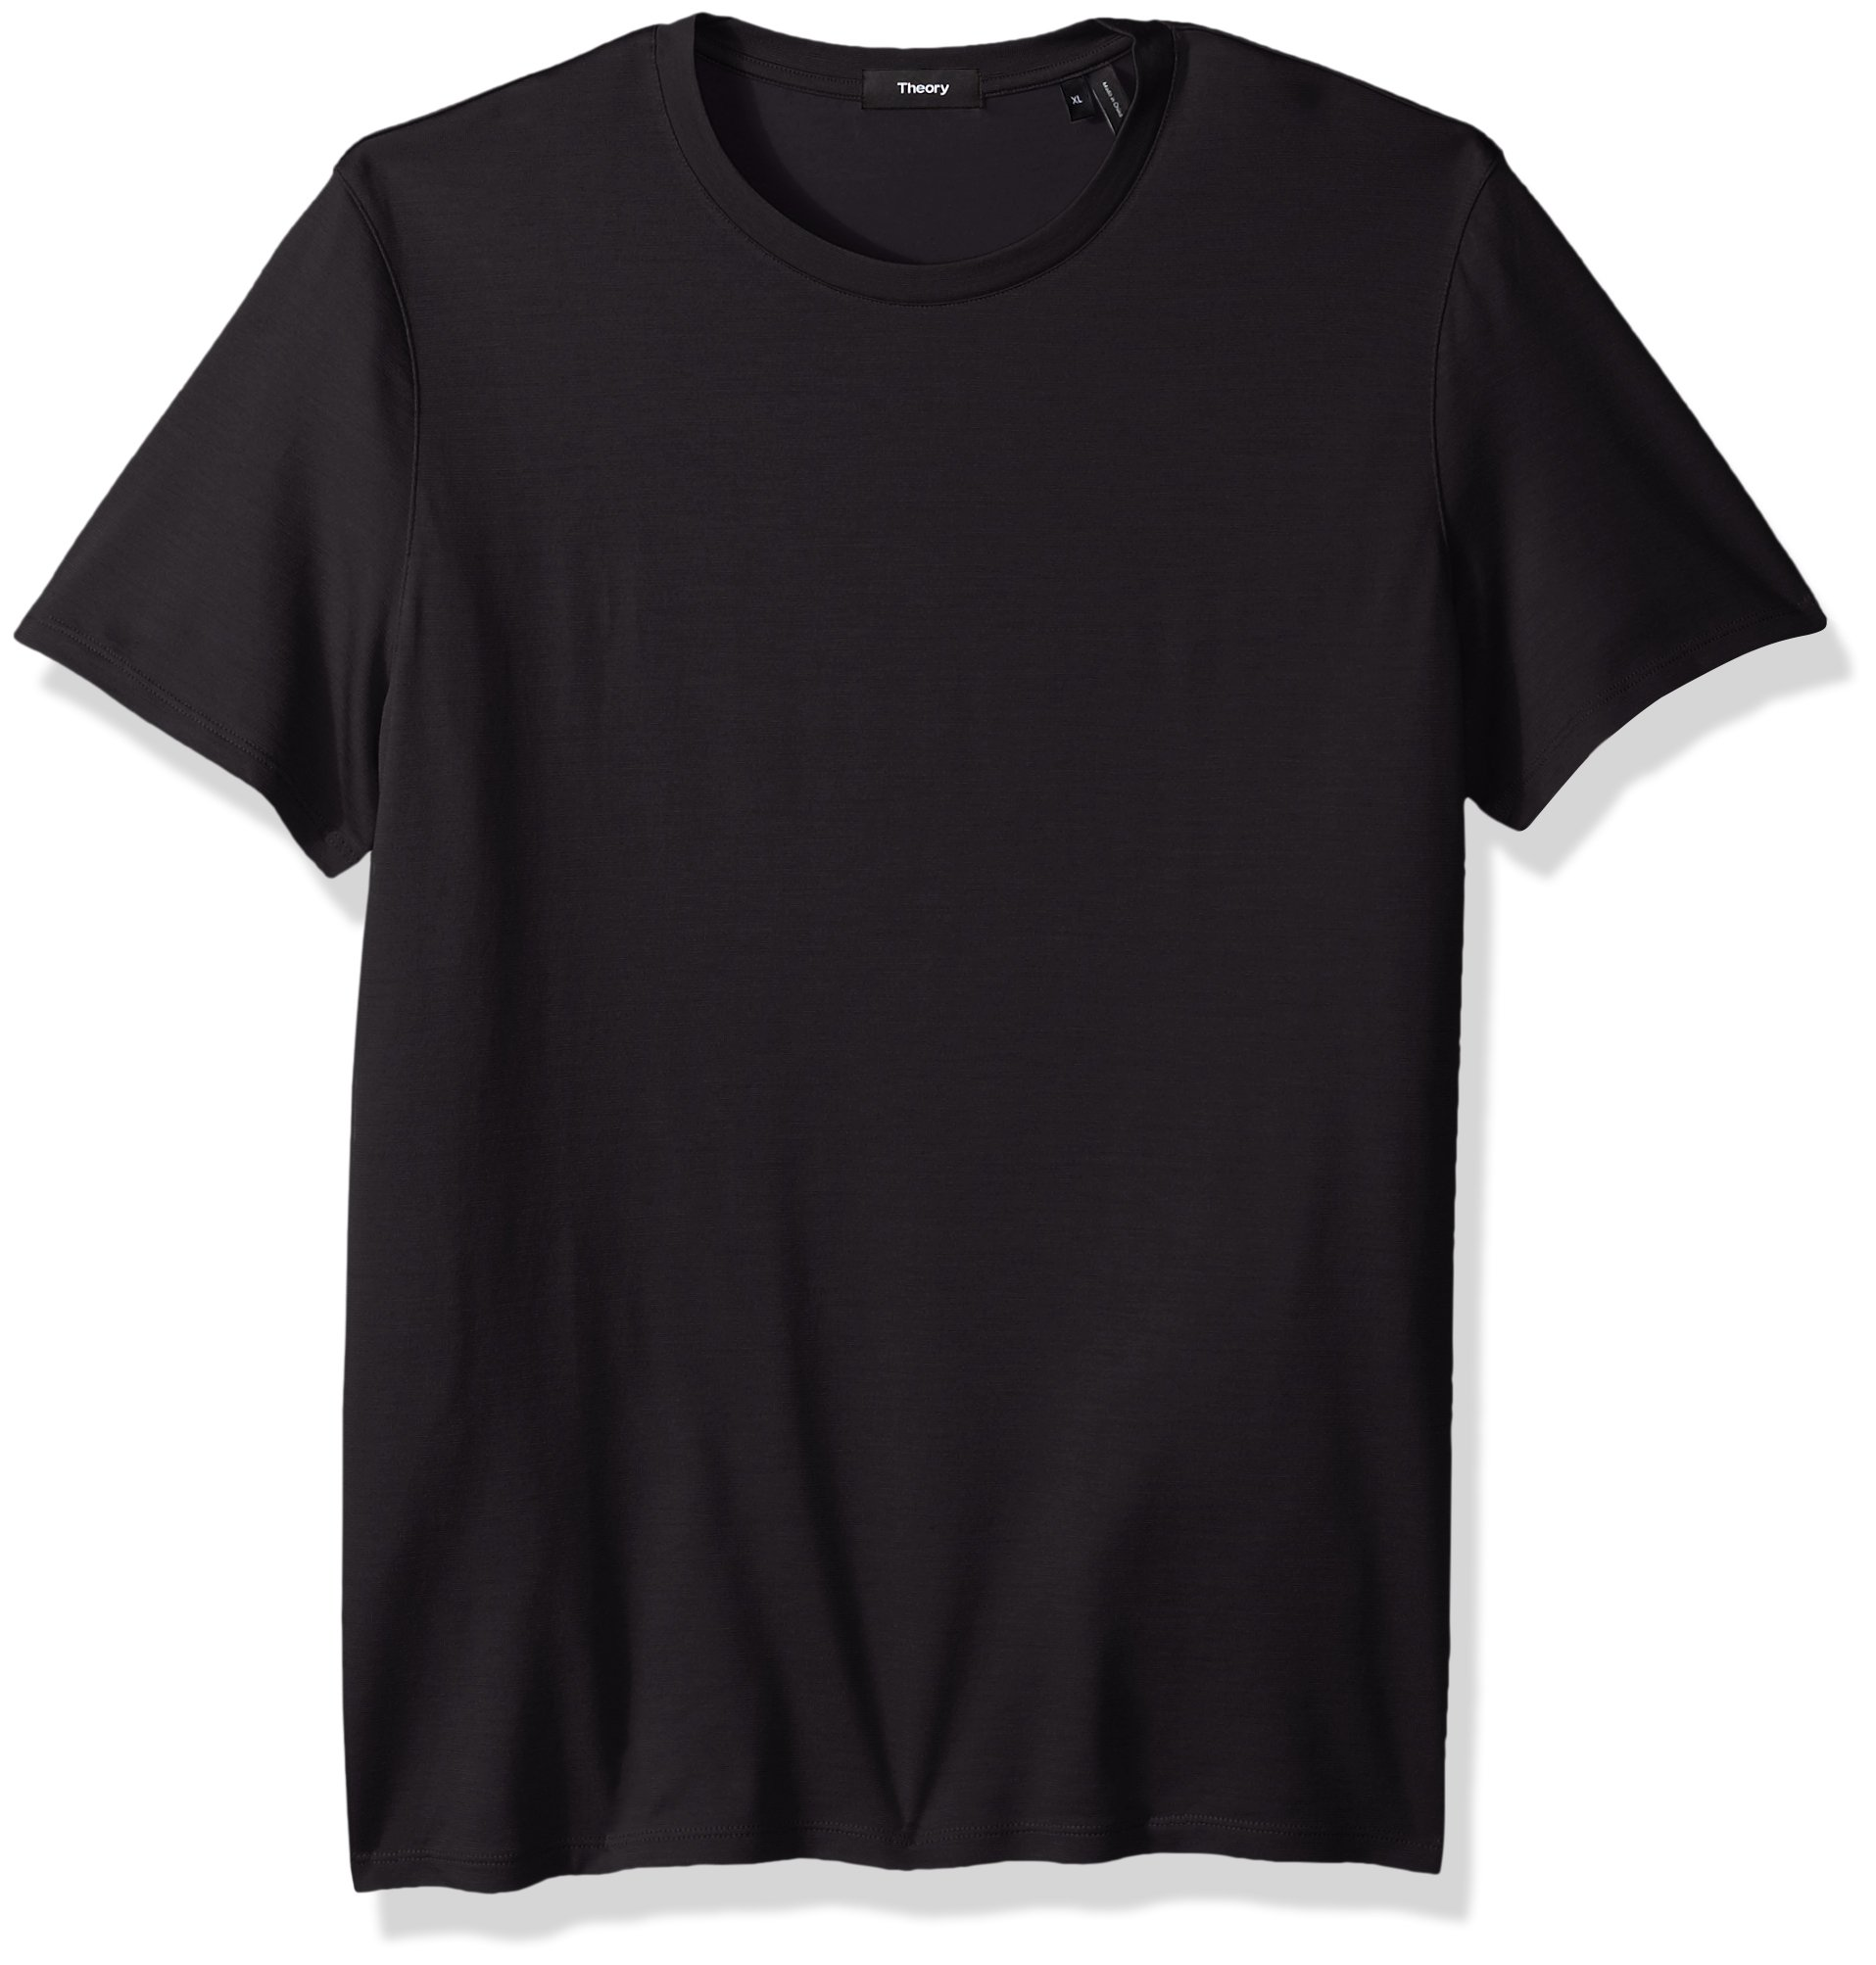 Theory Men's Dressy Silk Blend Crew Neck T-Shirt, Night, M